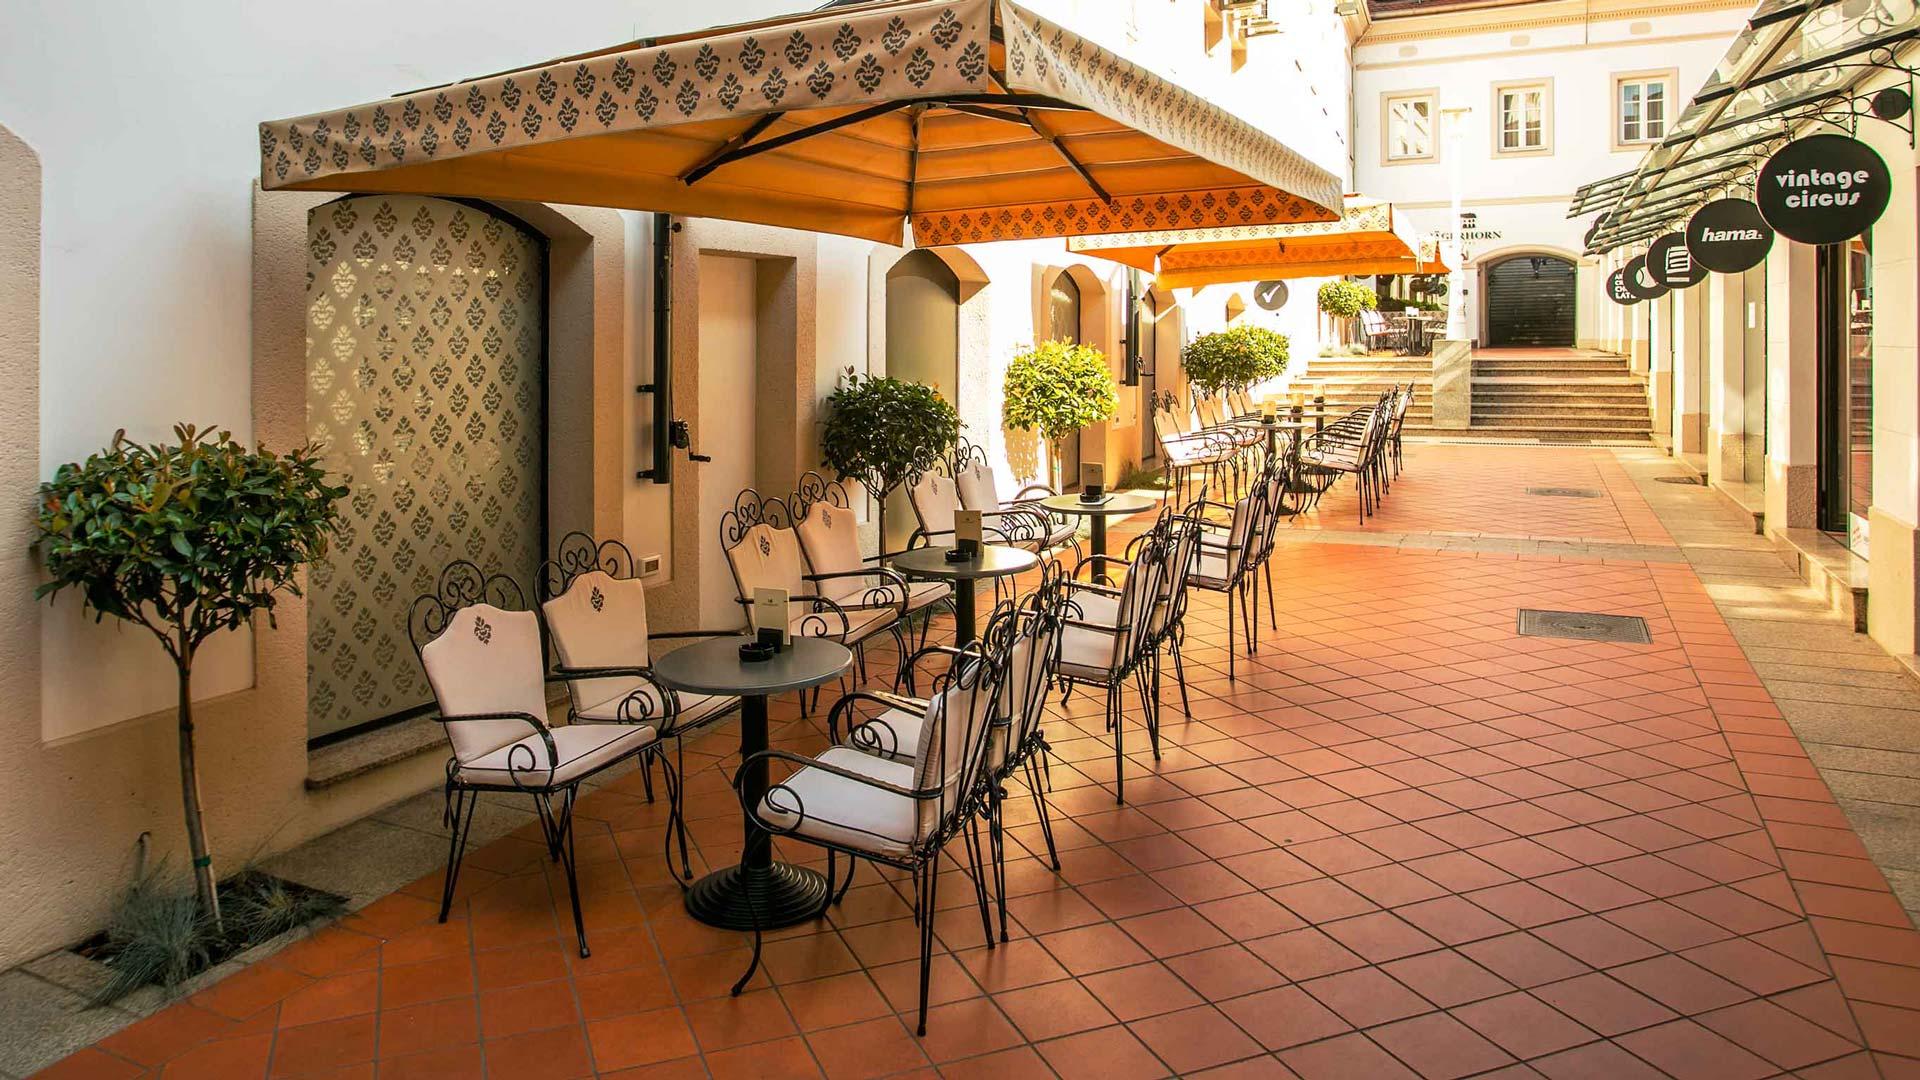 hotel j gerhorn boutique hotel zagreb croatia